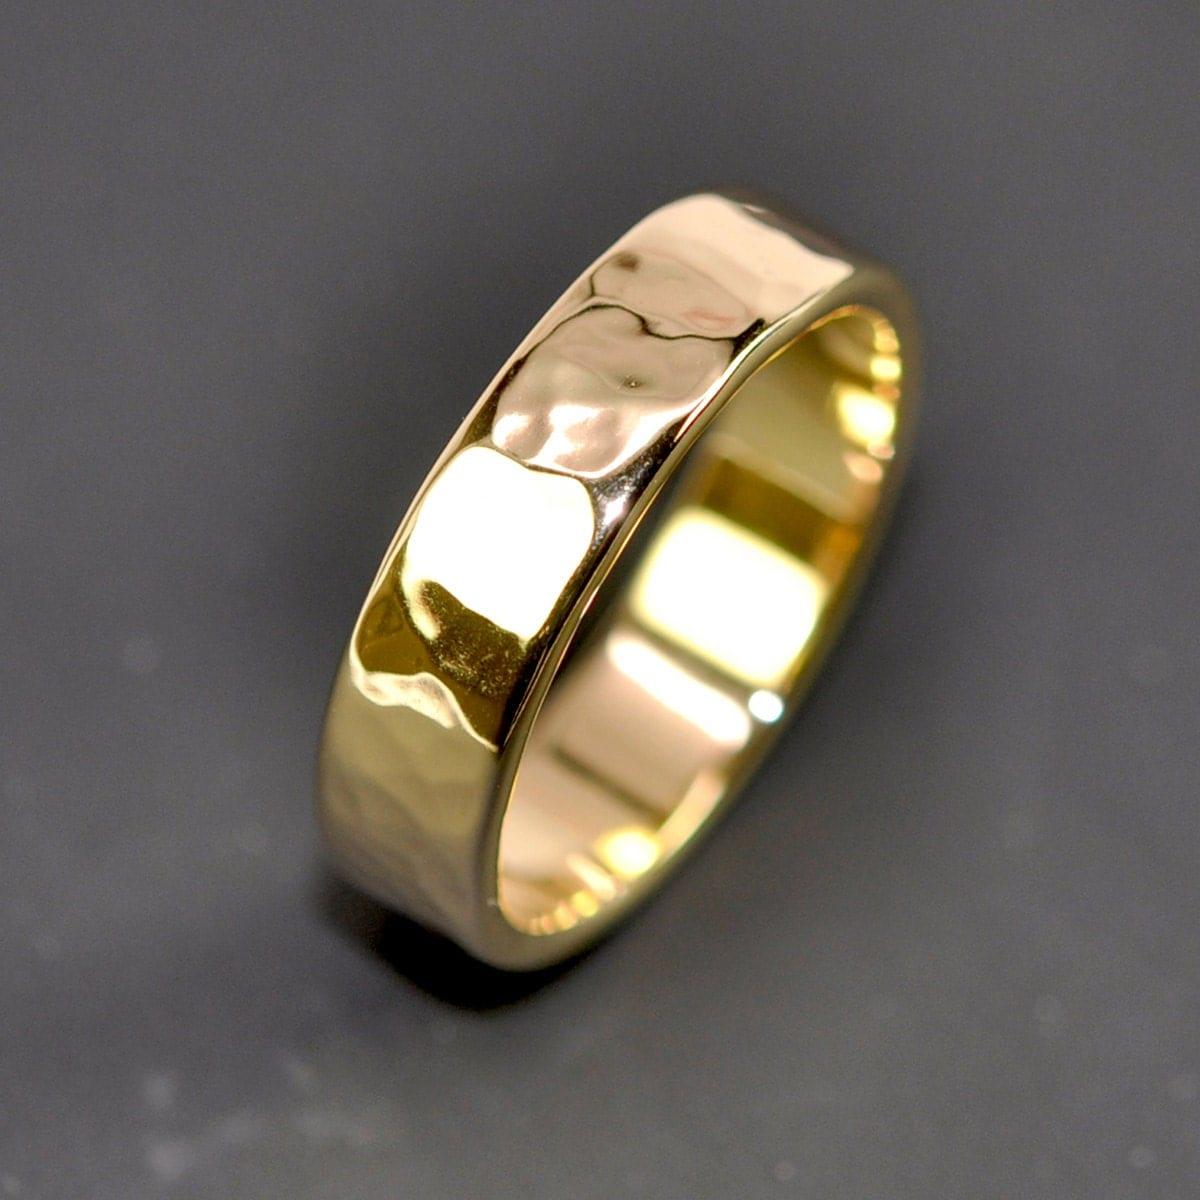 18k yellow gold mens wedding band 18k gold wedding bands zoom